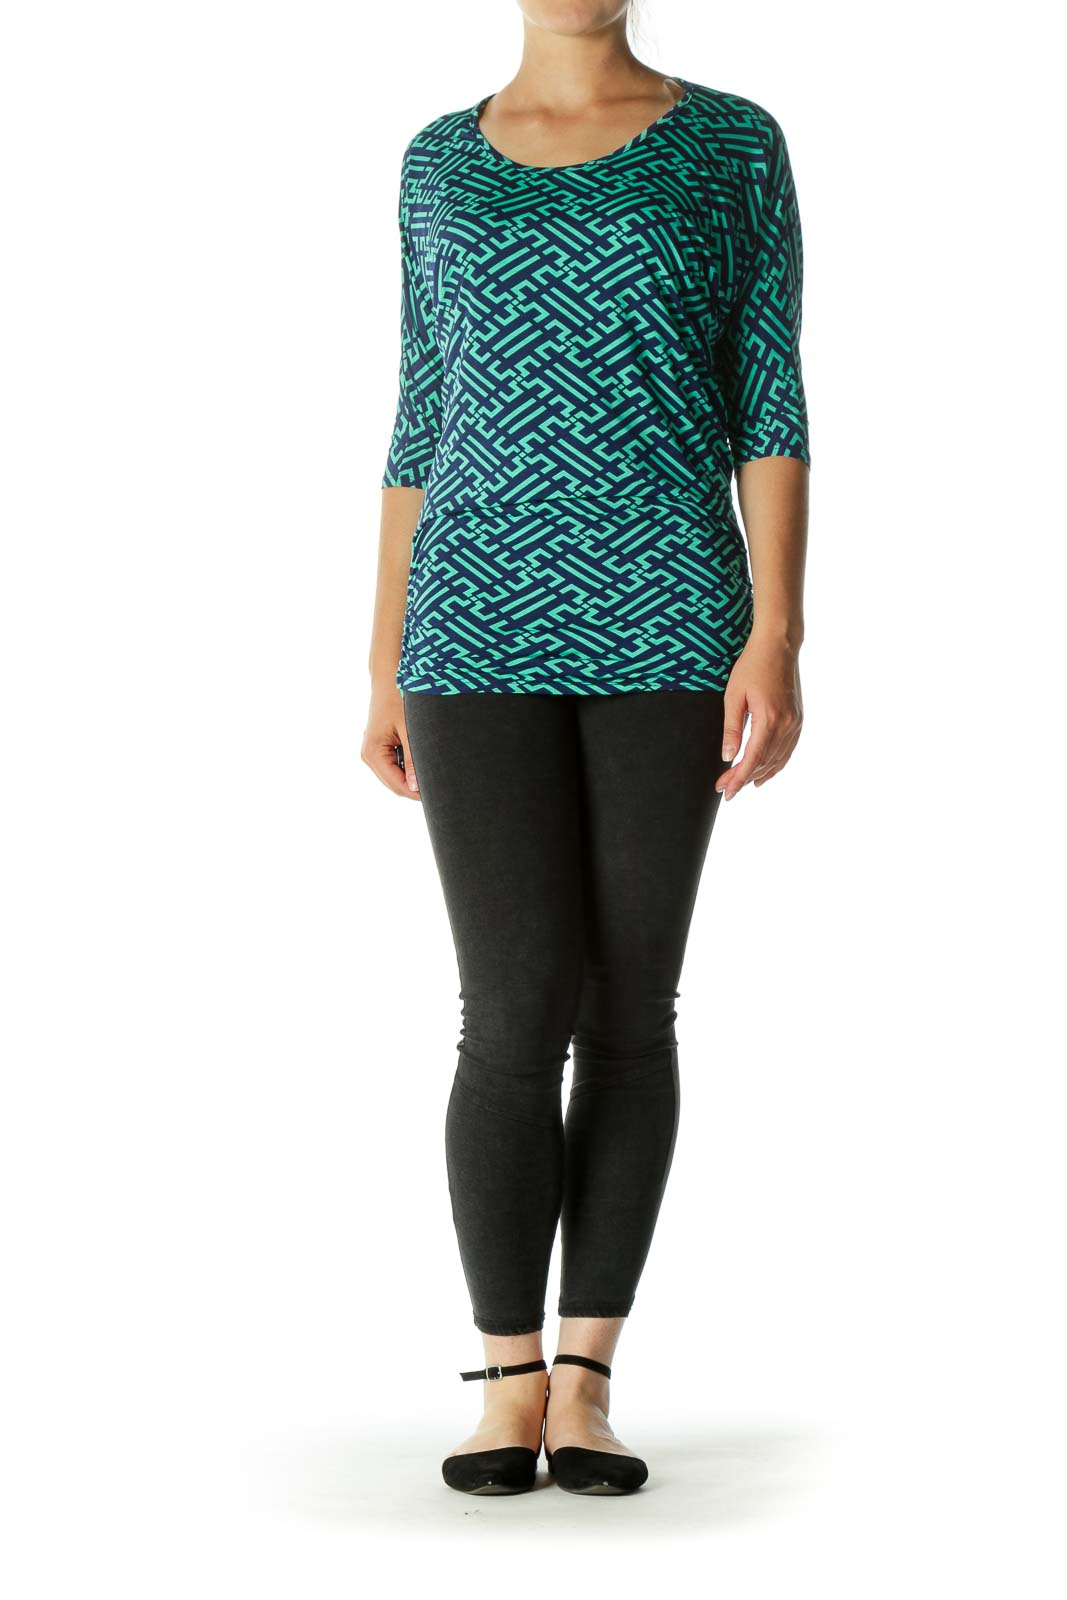 Green Blue Pattern Bat-Sleeves T-shirt